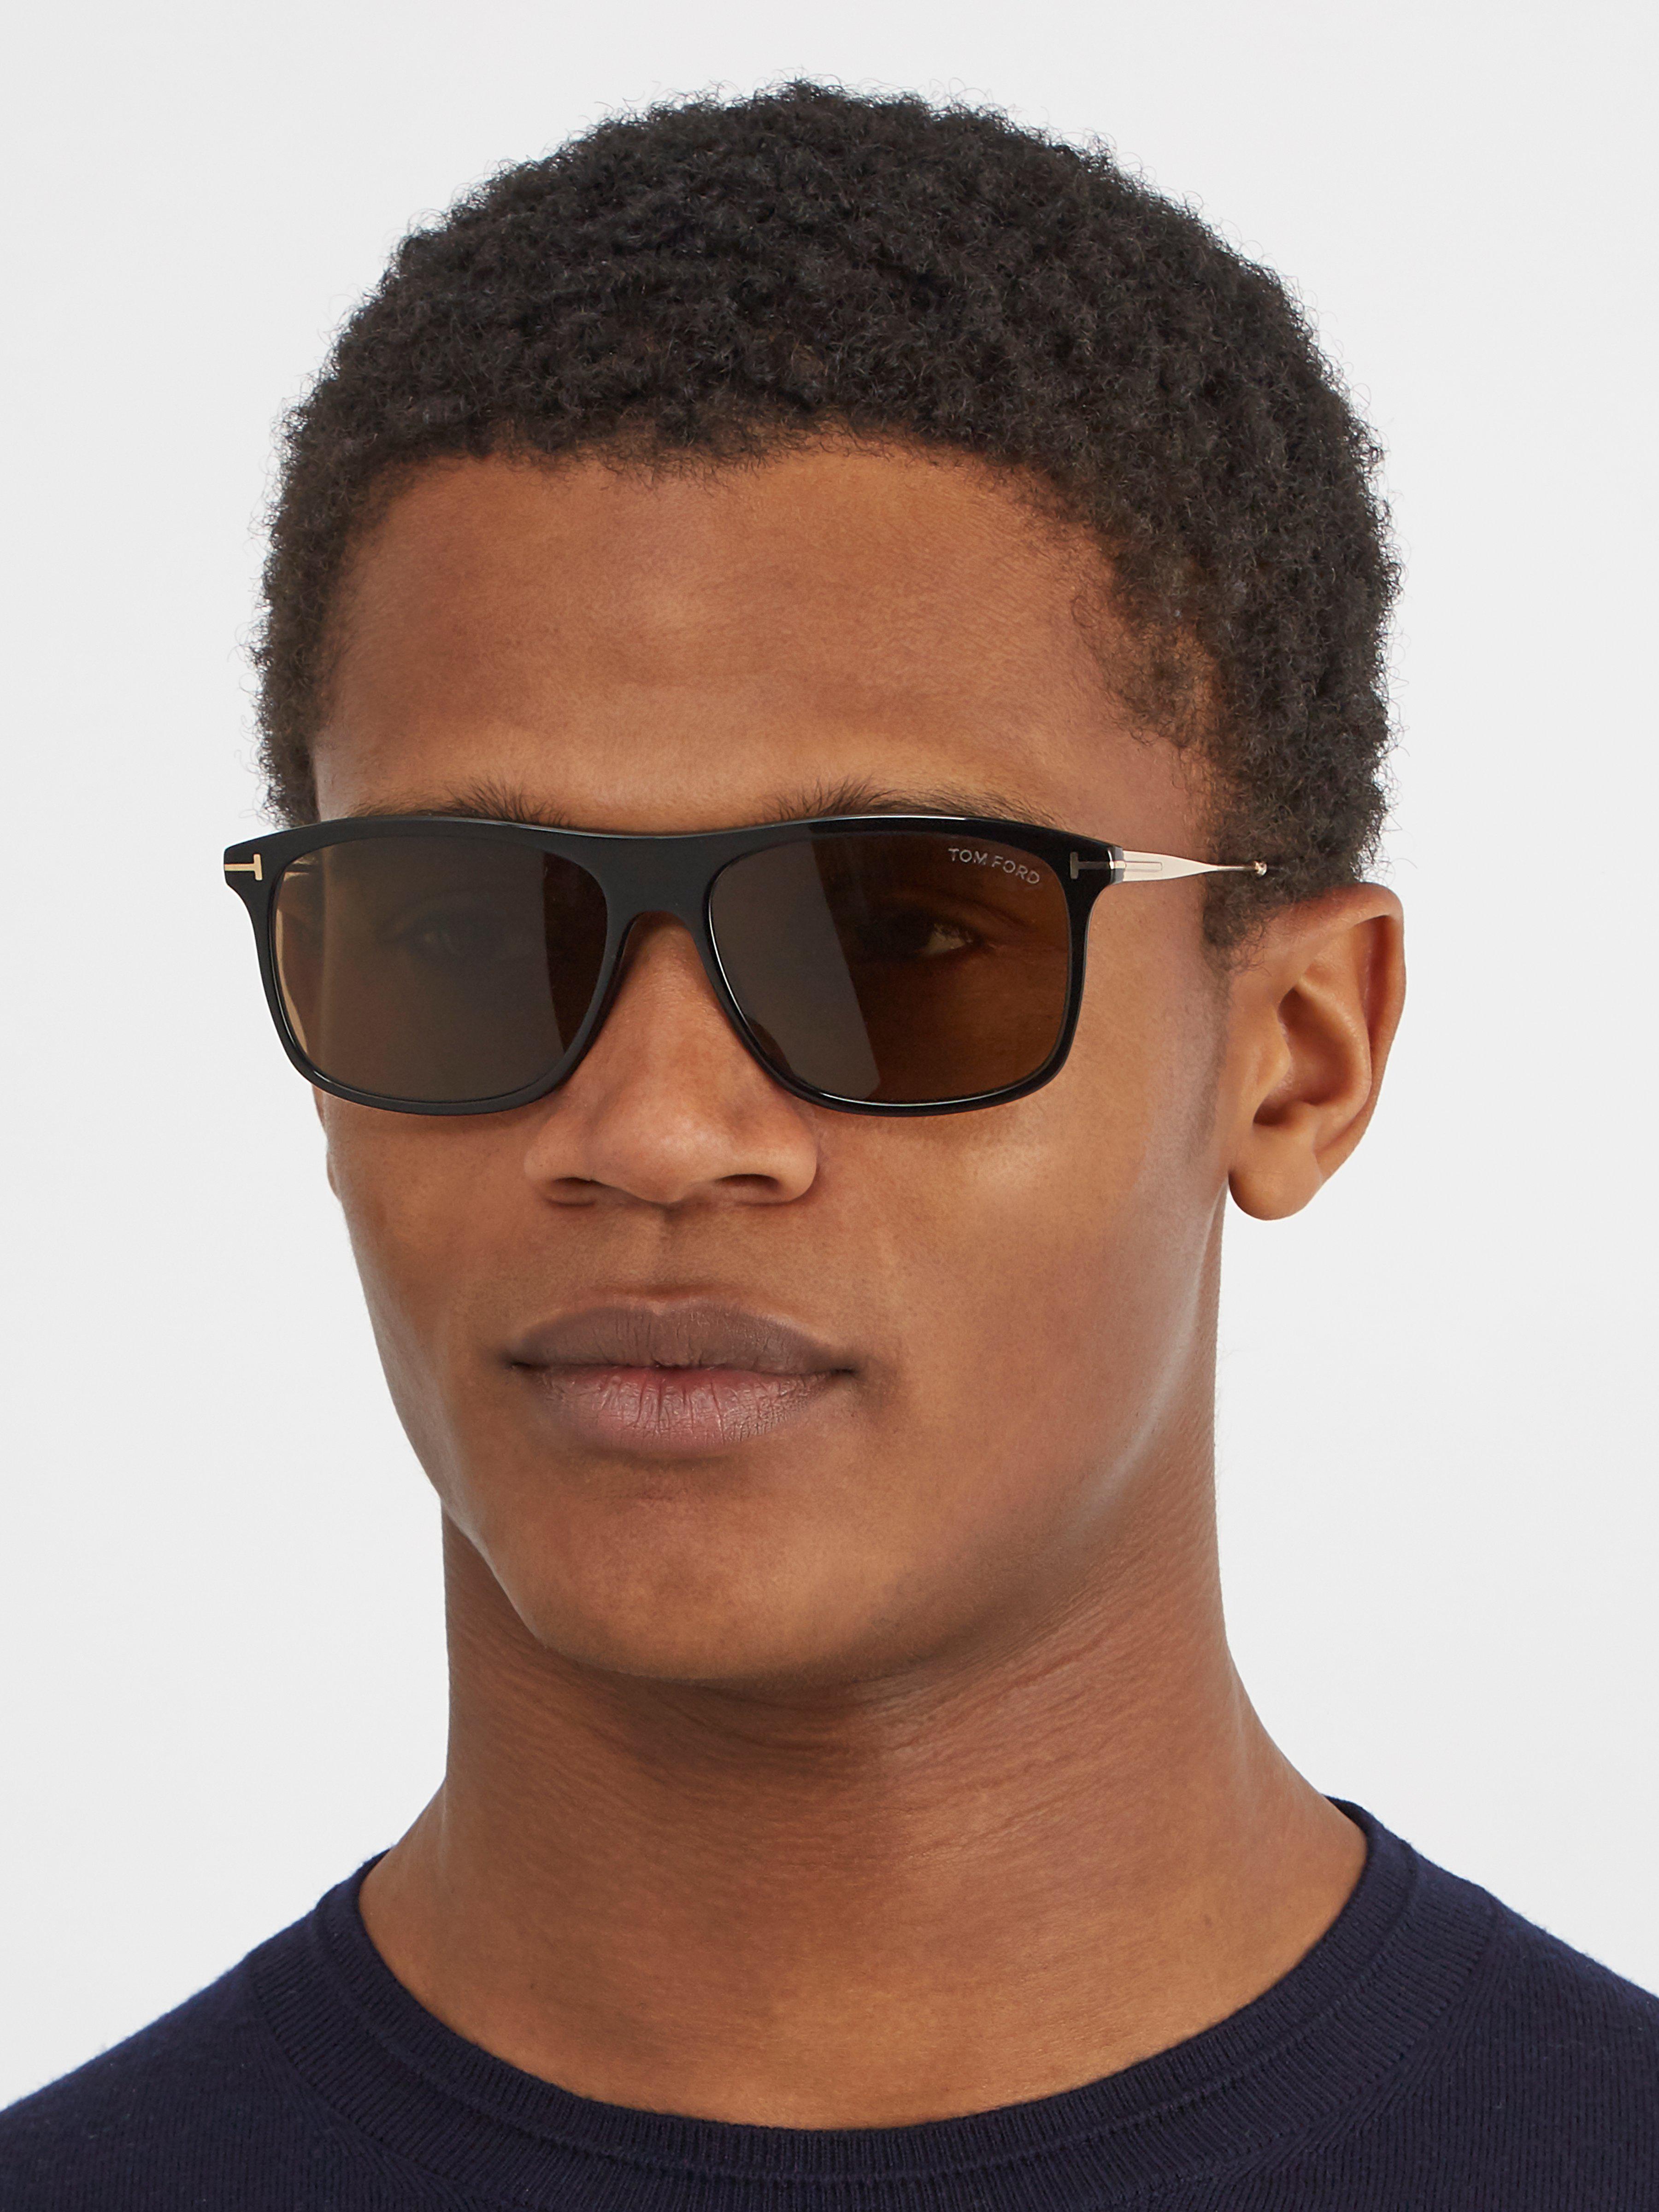 8c69aaff253 Tom Ford Eric Rectangle Frame Sunglasses in Black for Men - Lyst